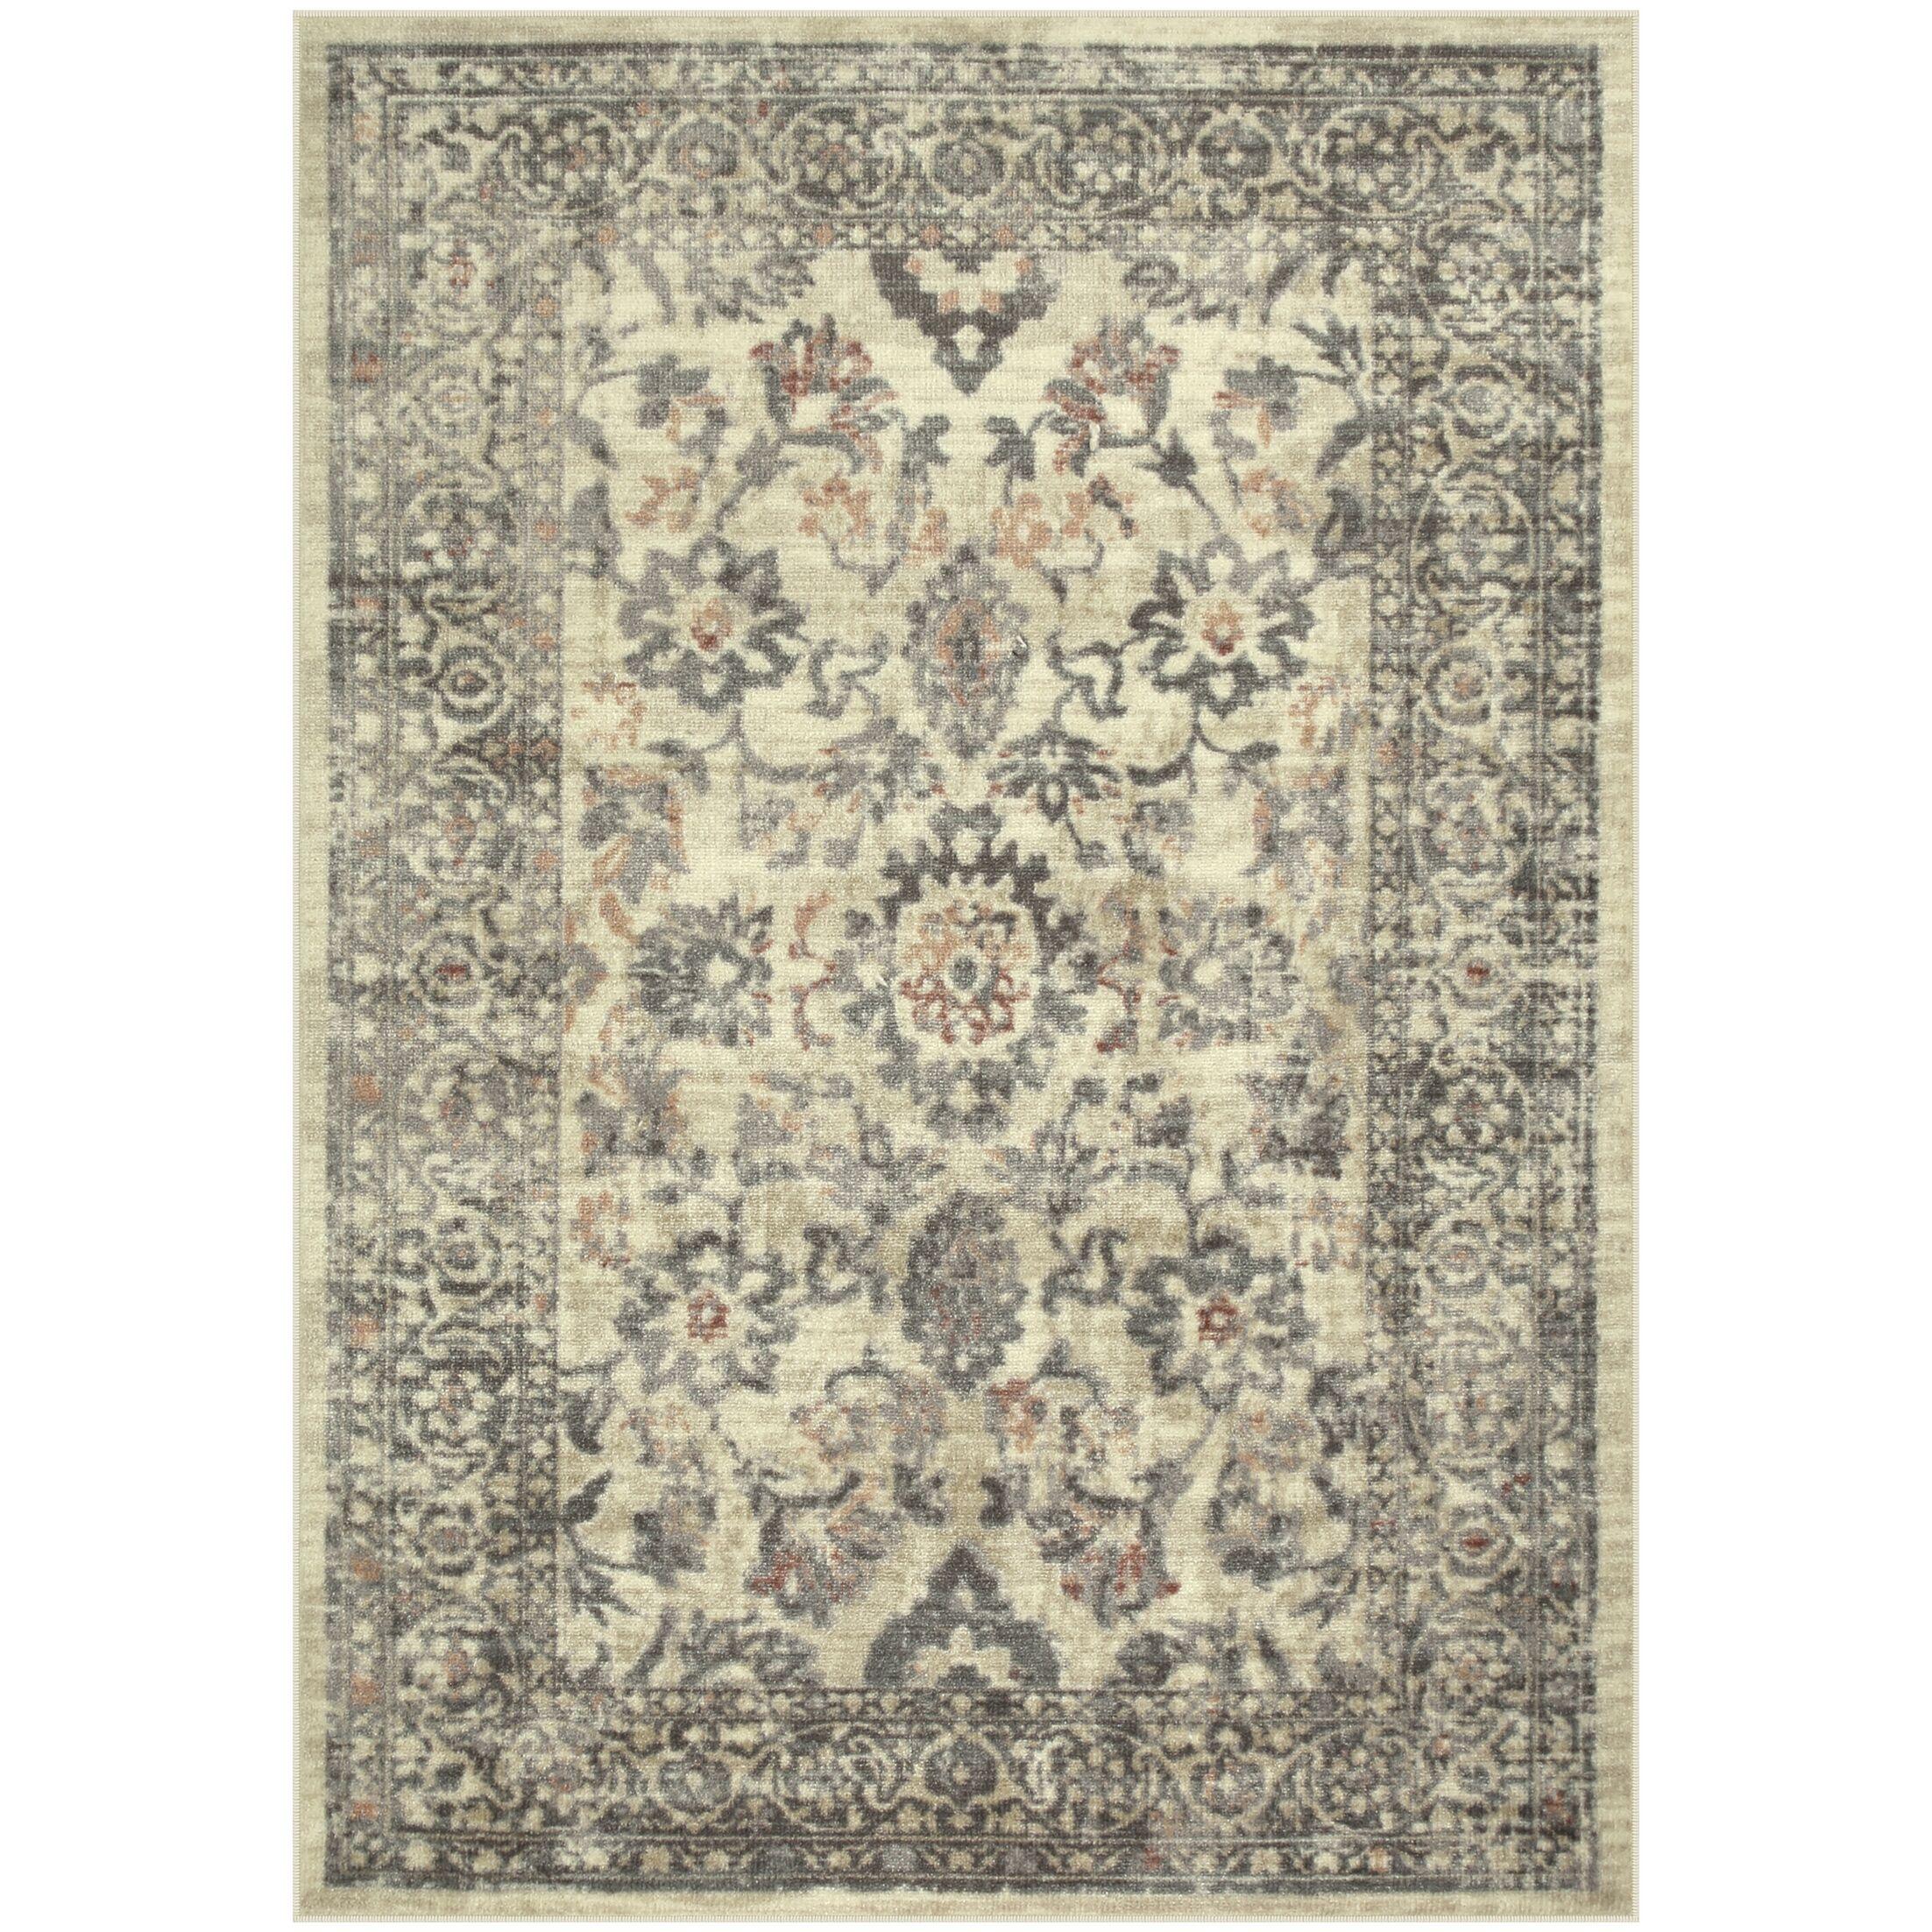 Mandalay Gray/Tan Area Rug Rug Size: Rectangle 5' x 7'